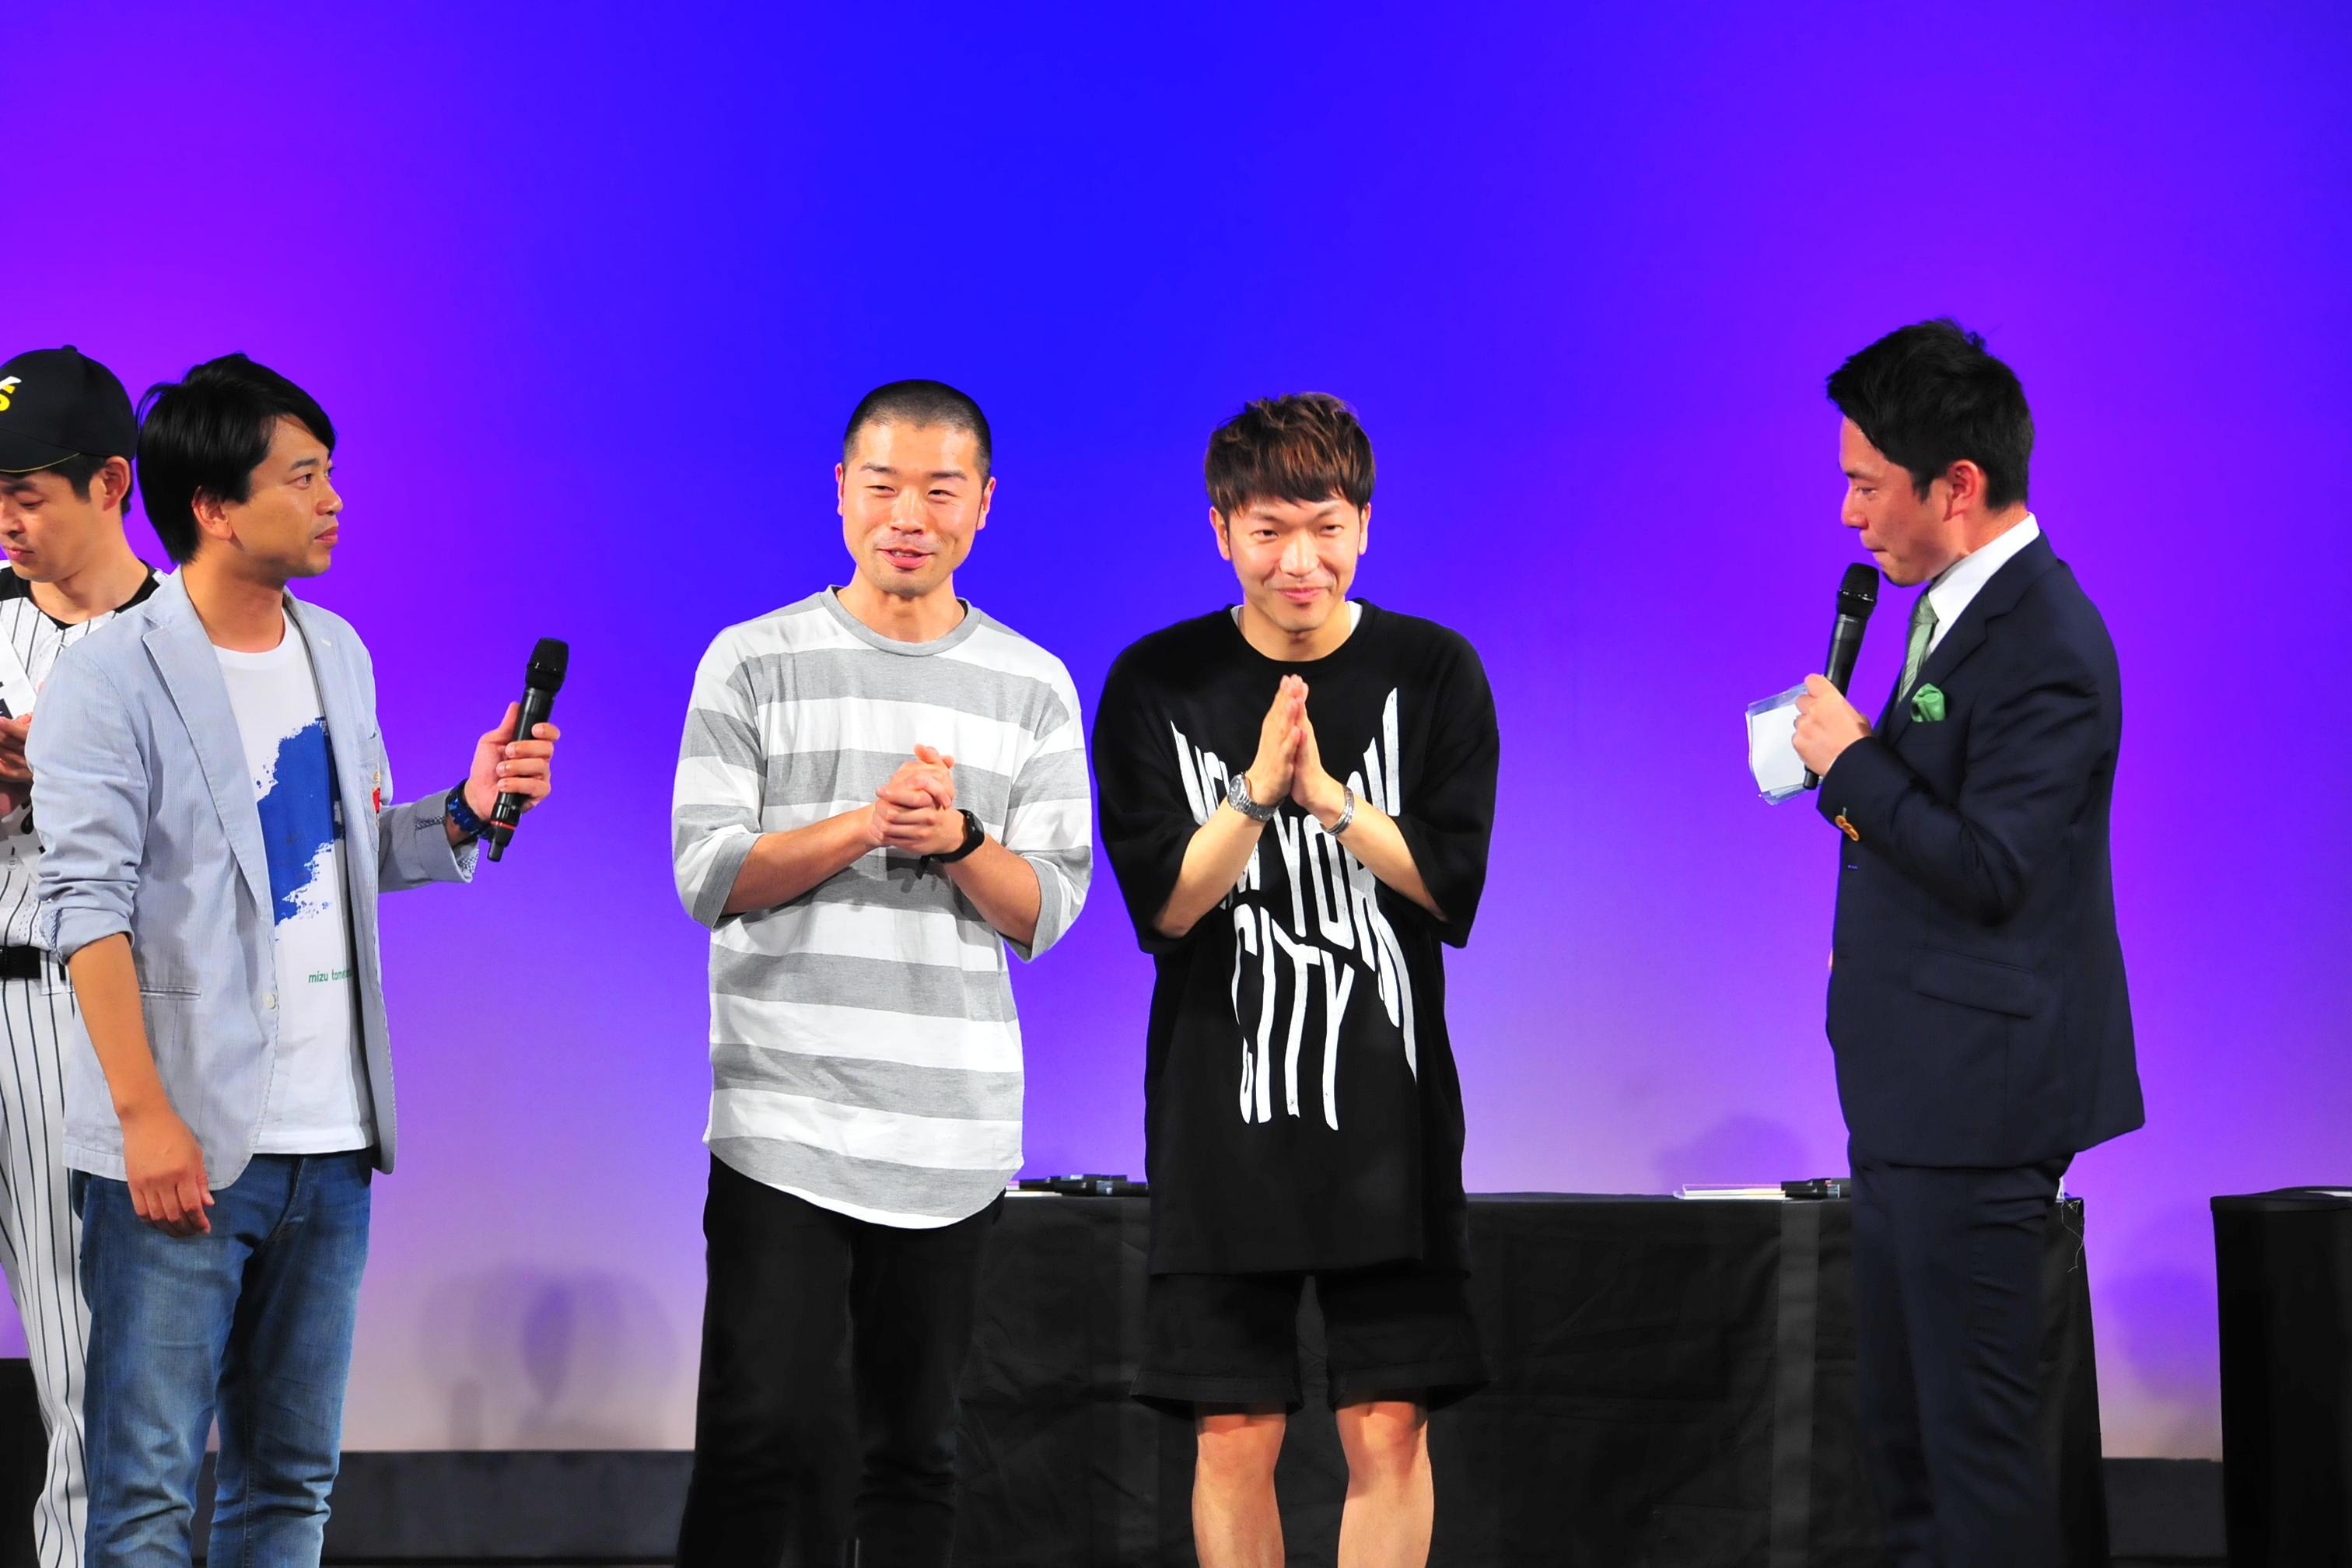 http://news.yoshimoto.co.jp/20160516144230-96832d1bc279c17491b08c574453bea61bb777ae.jpg